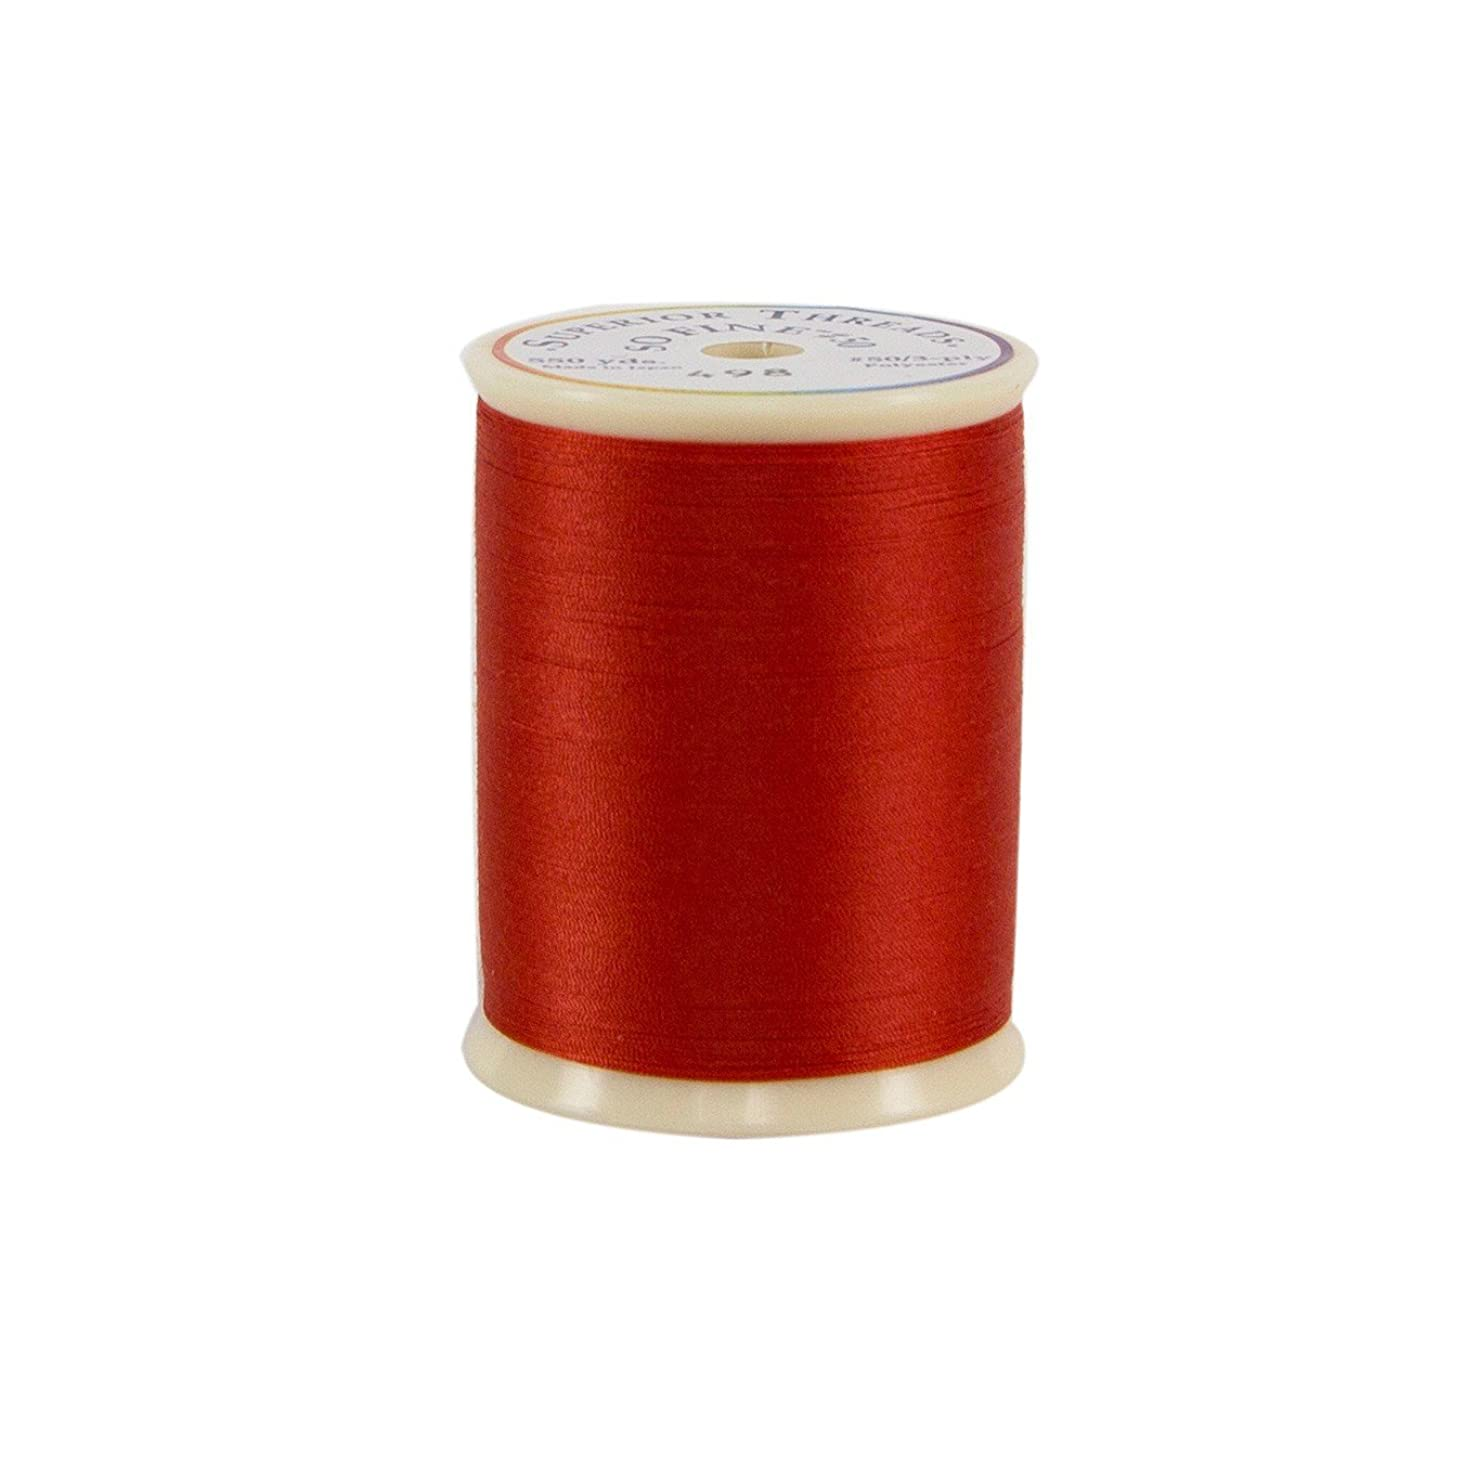 Superior Threads 11601A-498 So Fine Sandstone 50W Polyester Thread, 550 yd